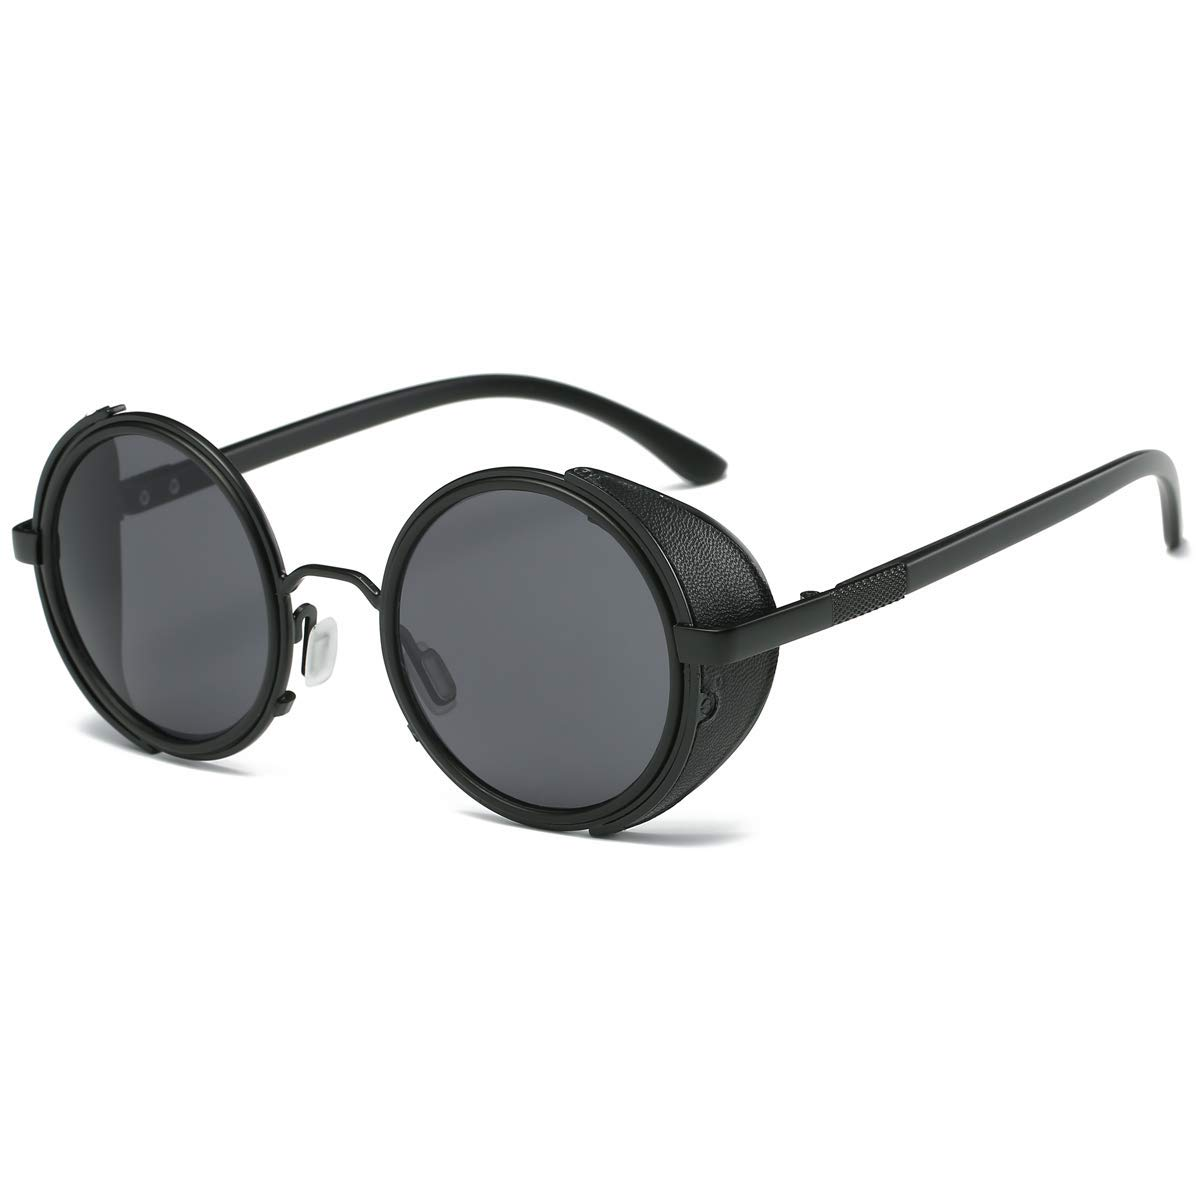 162226be838 Amazon.com  Dollger Steampunk Vintage Retro Round Sunglasses Metal Circle  Frame (Black Lens+Black Frame